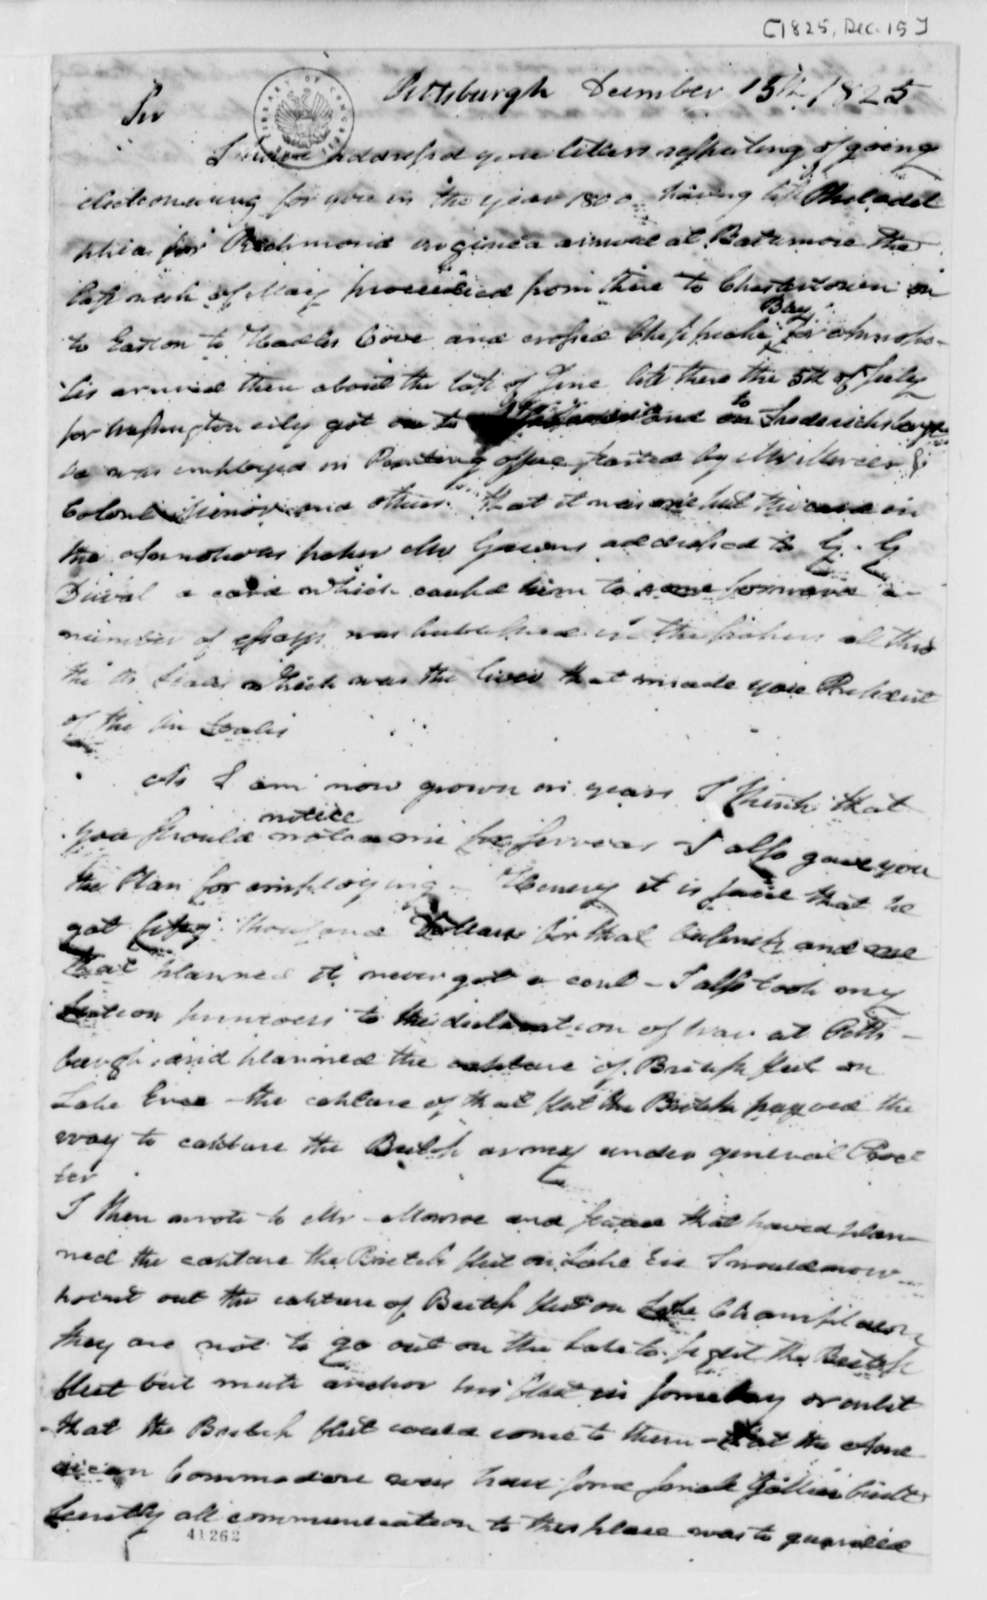 Robert Smith to Thomas Jefferson, December 15, 1825